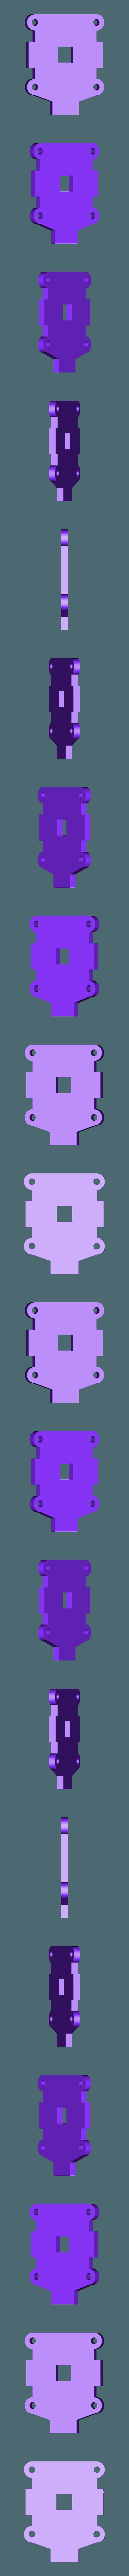 20x20_micro_swift_2.stl Download free STL file 20x20 Runcam Swift micro VTX03 Pod • 3D printer model, Domi1988